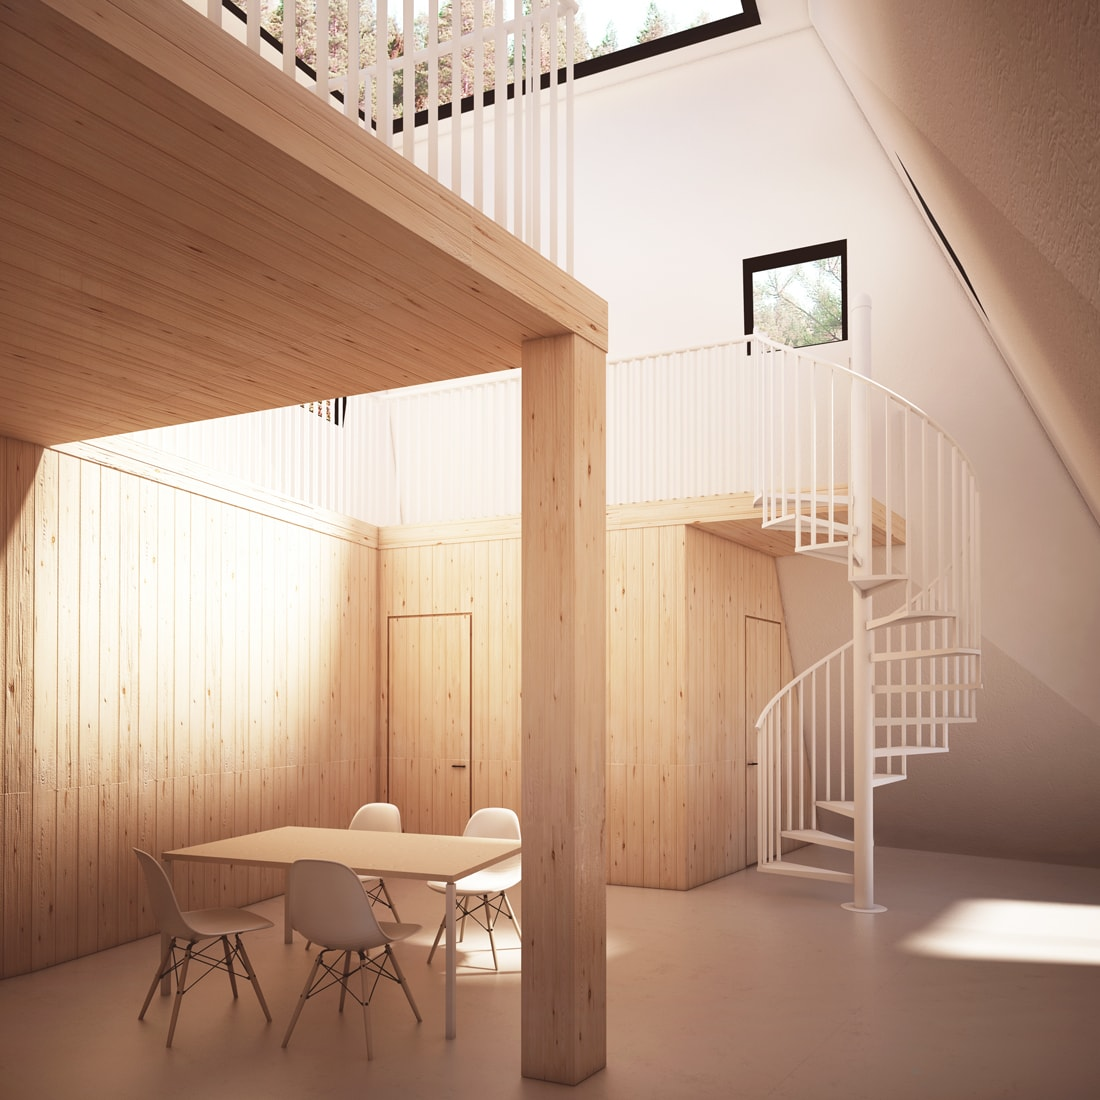 nexus contemporary tower wooden house interior